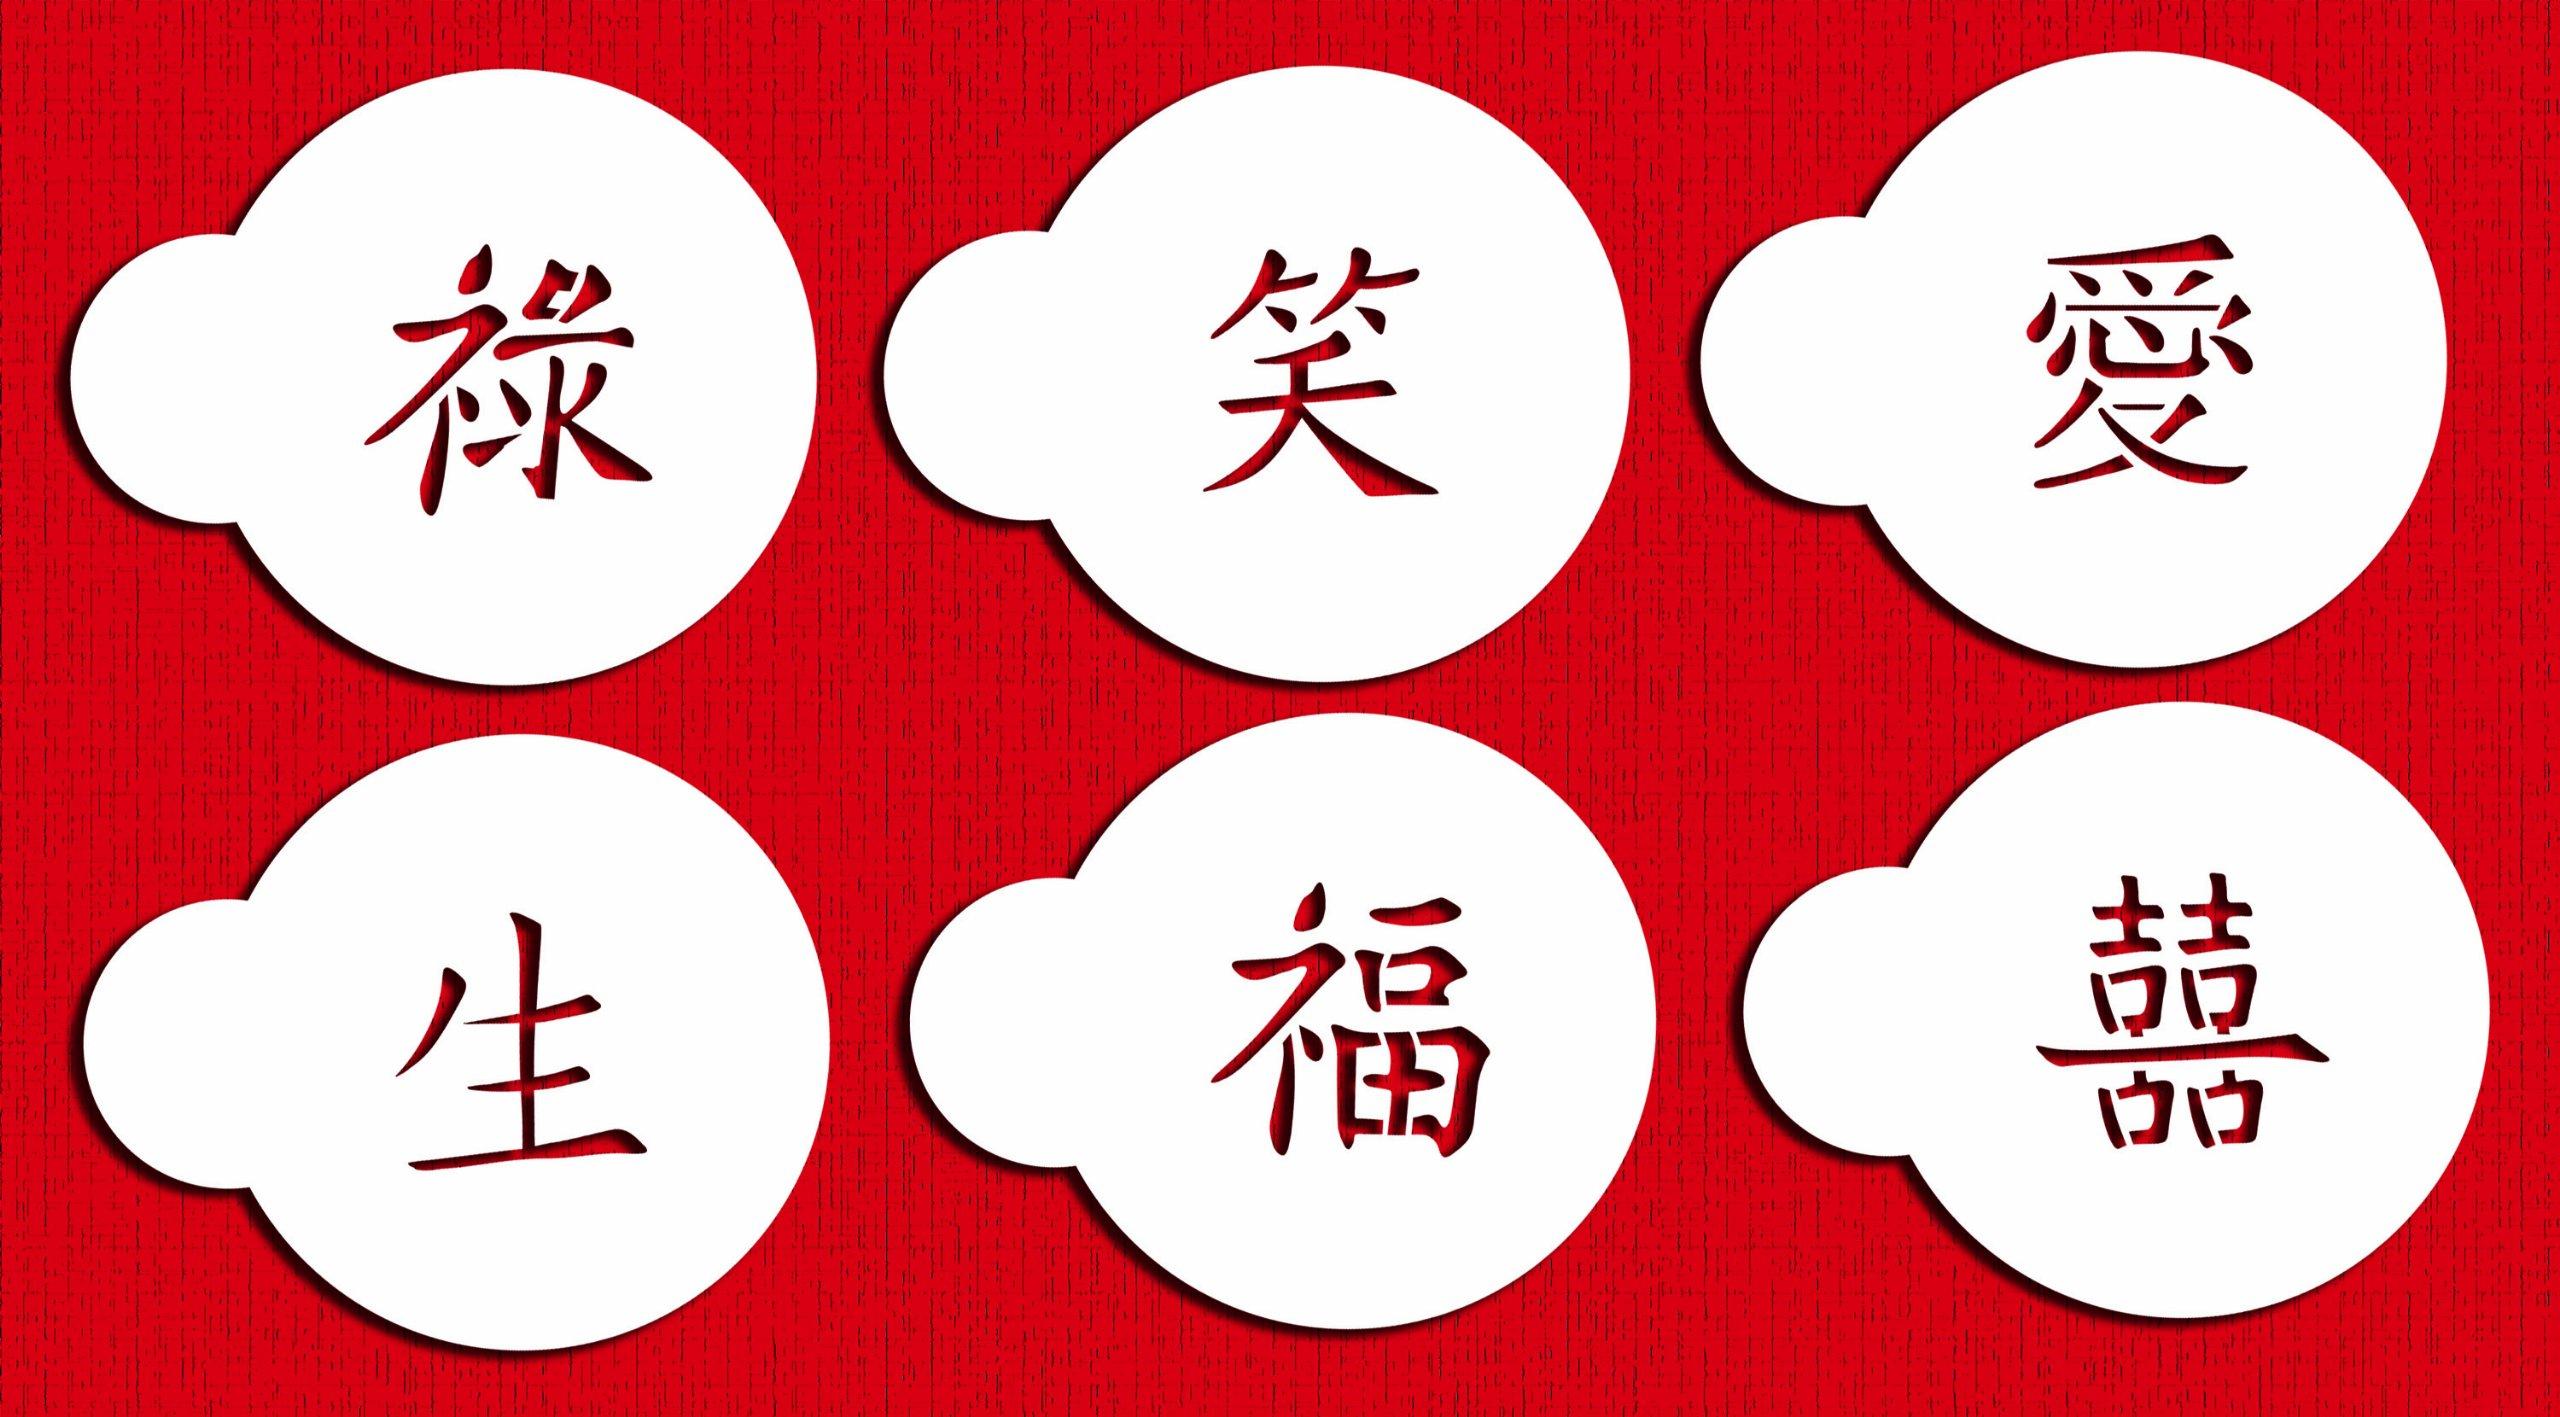 Designer Stencils C803 Chinese Characters Stencil Set, Mini, Beige/Semi-Transparent